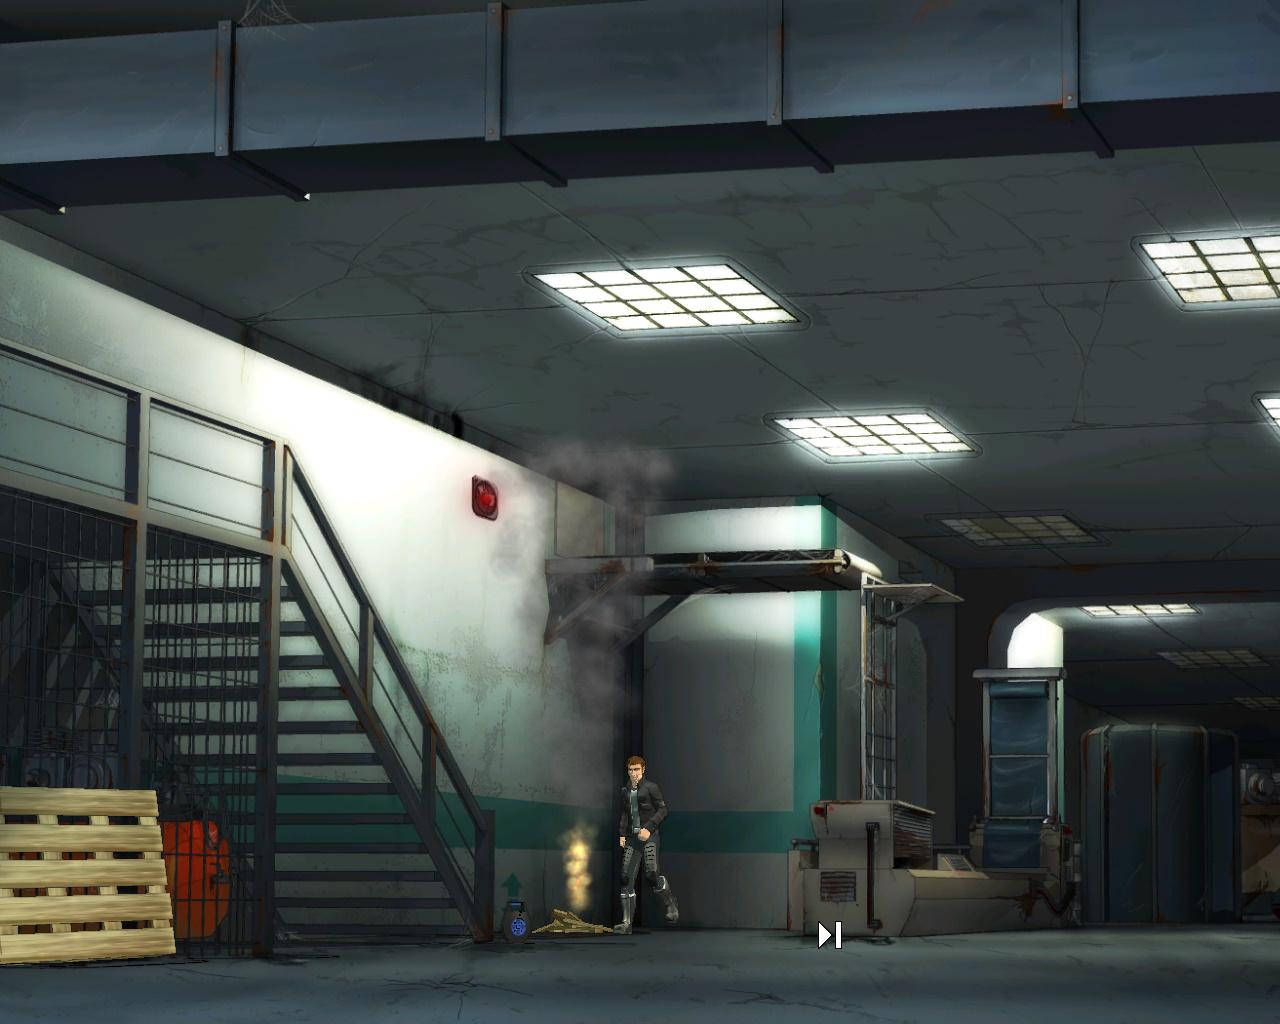 Goin' Downtown - пожар на складе фабрики (уровень 2)